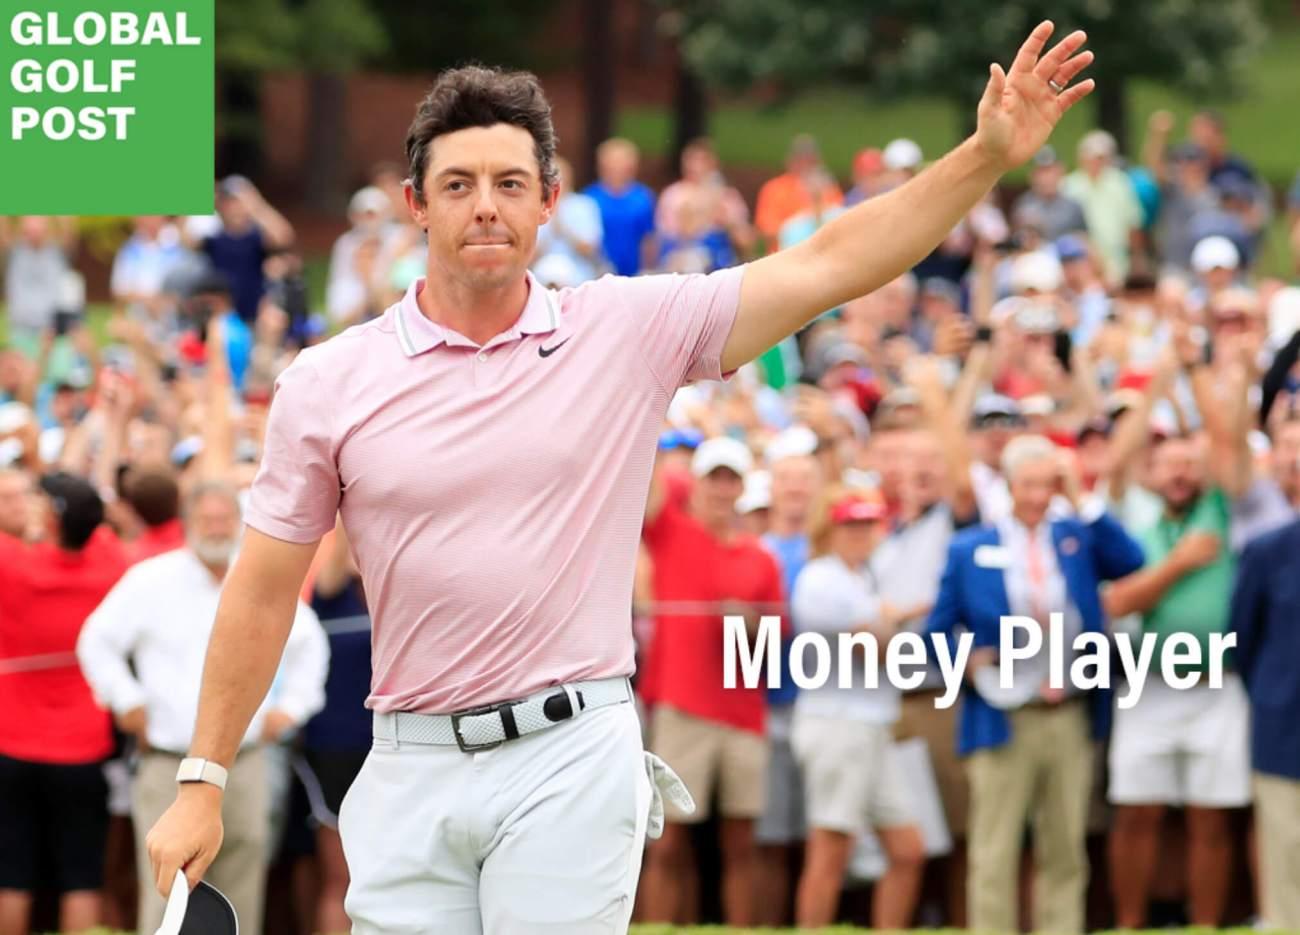 Read Global Golf Post, Aug. 26